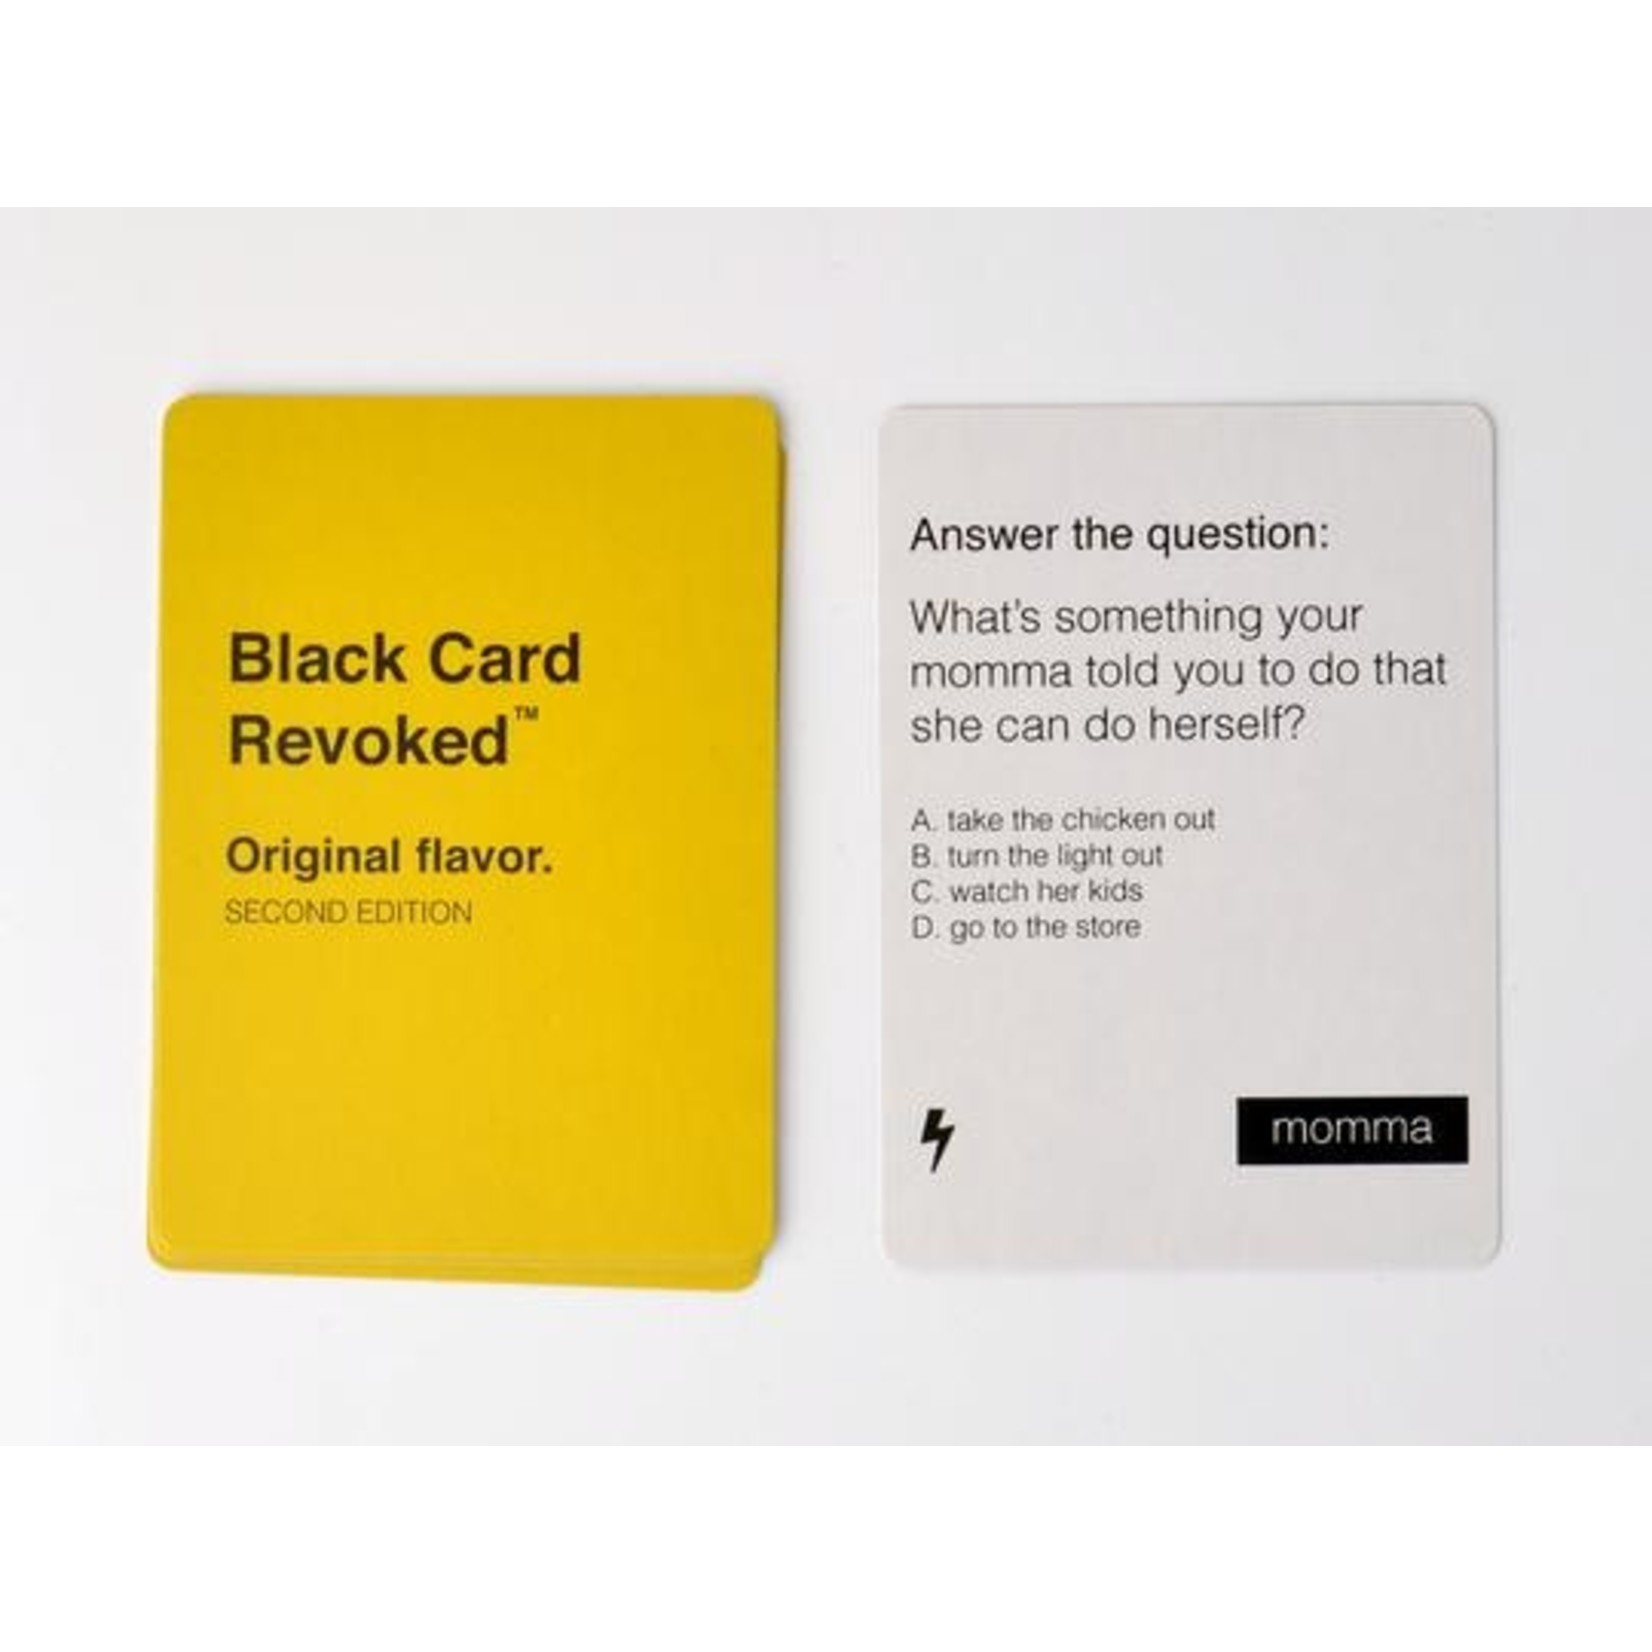 Black Card Revoked - Original Flavor 2